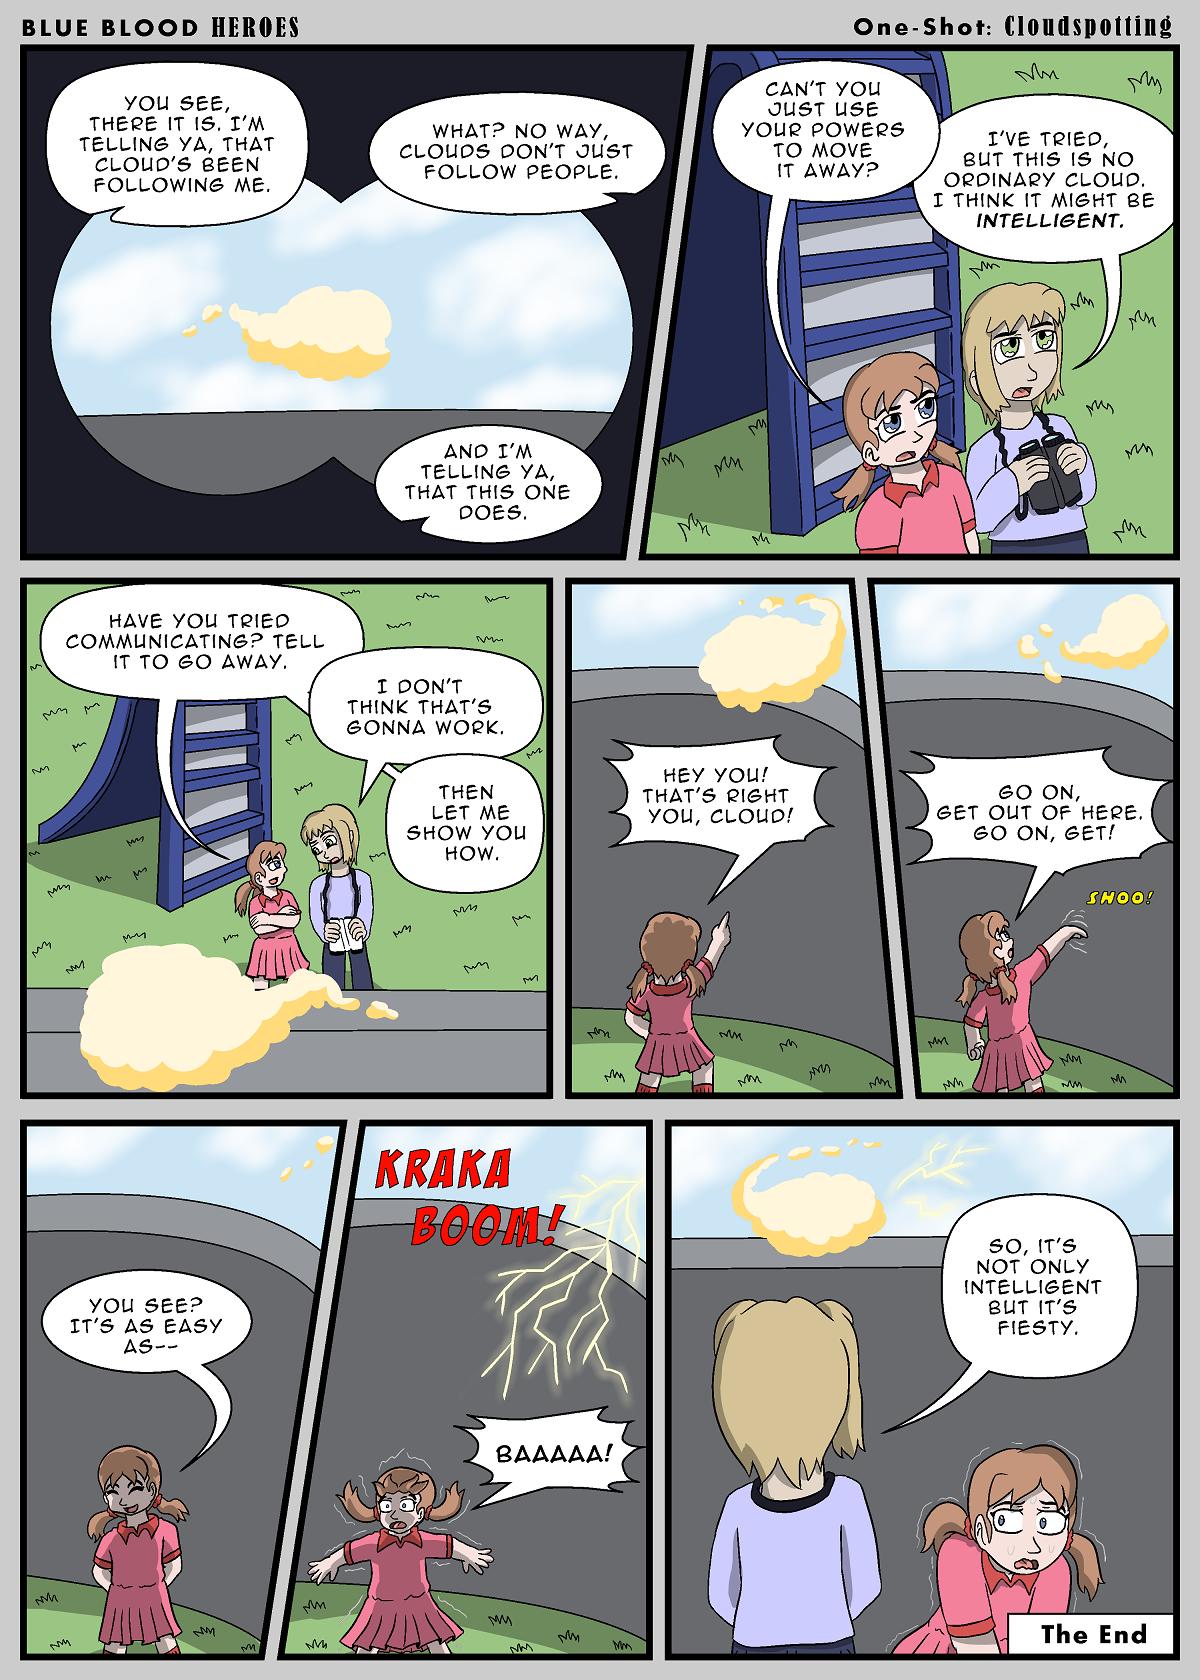 True Blue Filler: Cloudspotting